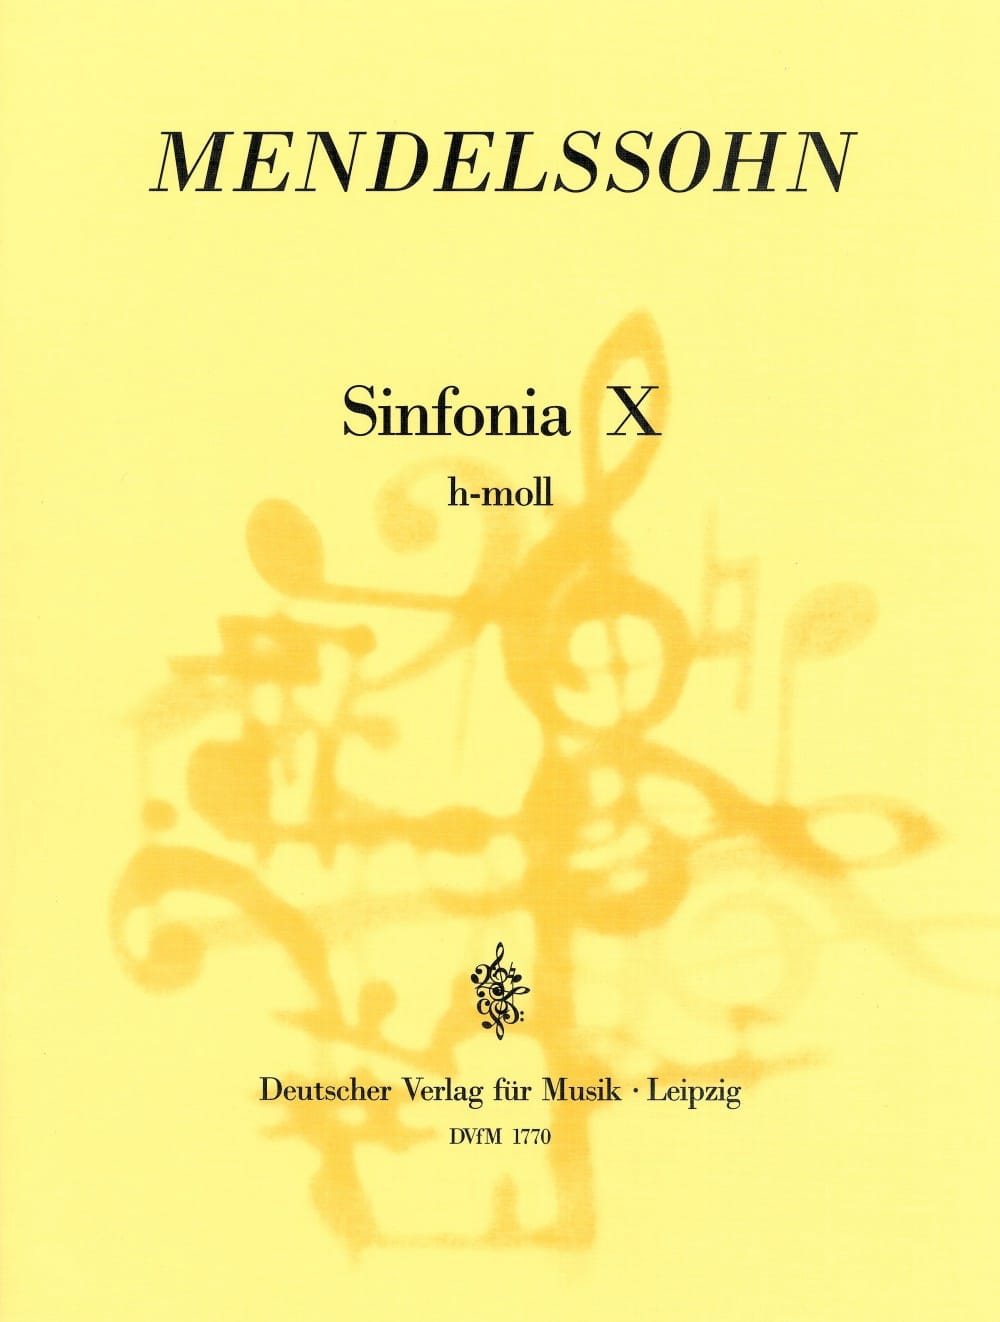 MENDELSSOHN - Sinfonia Nr. 10 h-moll - Partitur - Partition - di-arezzo.fr